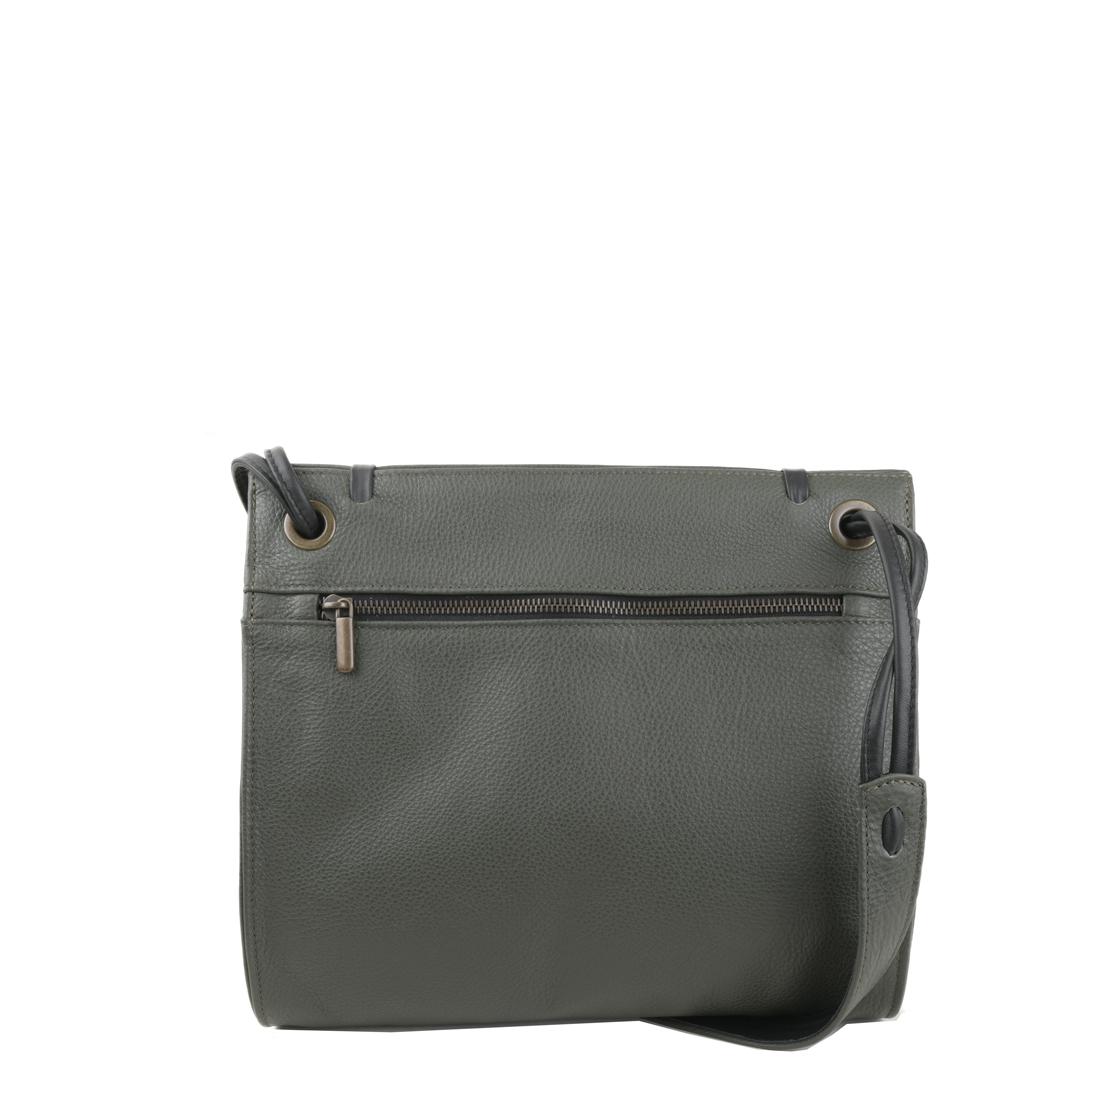 Elsa Loden Leather Across Body Bag